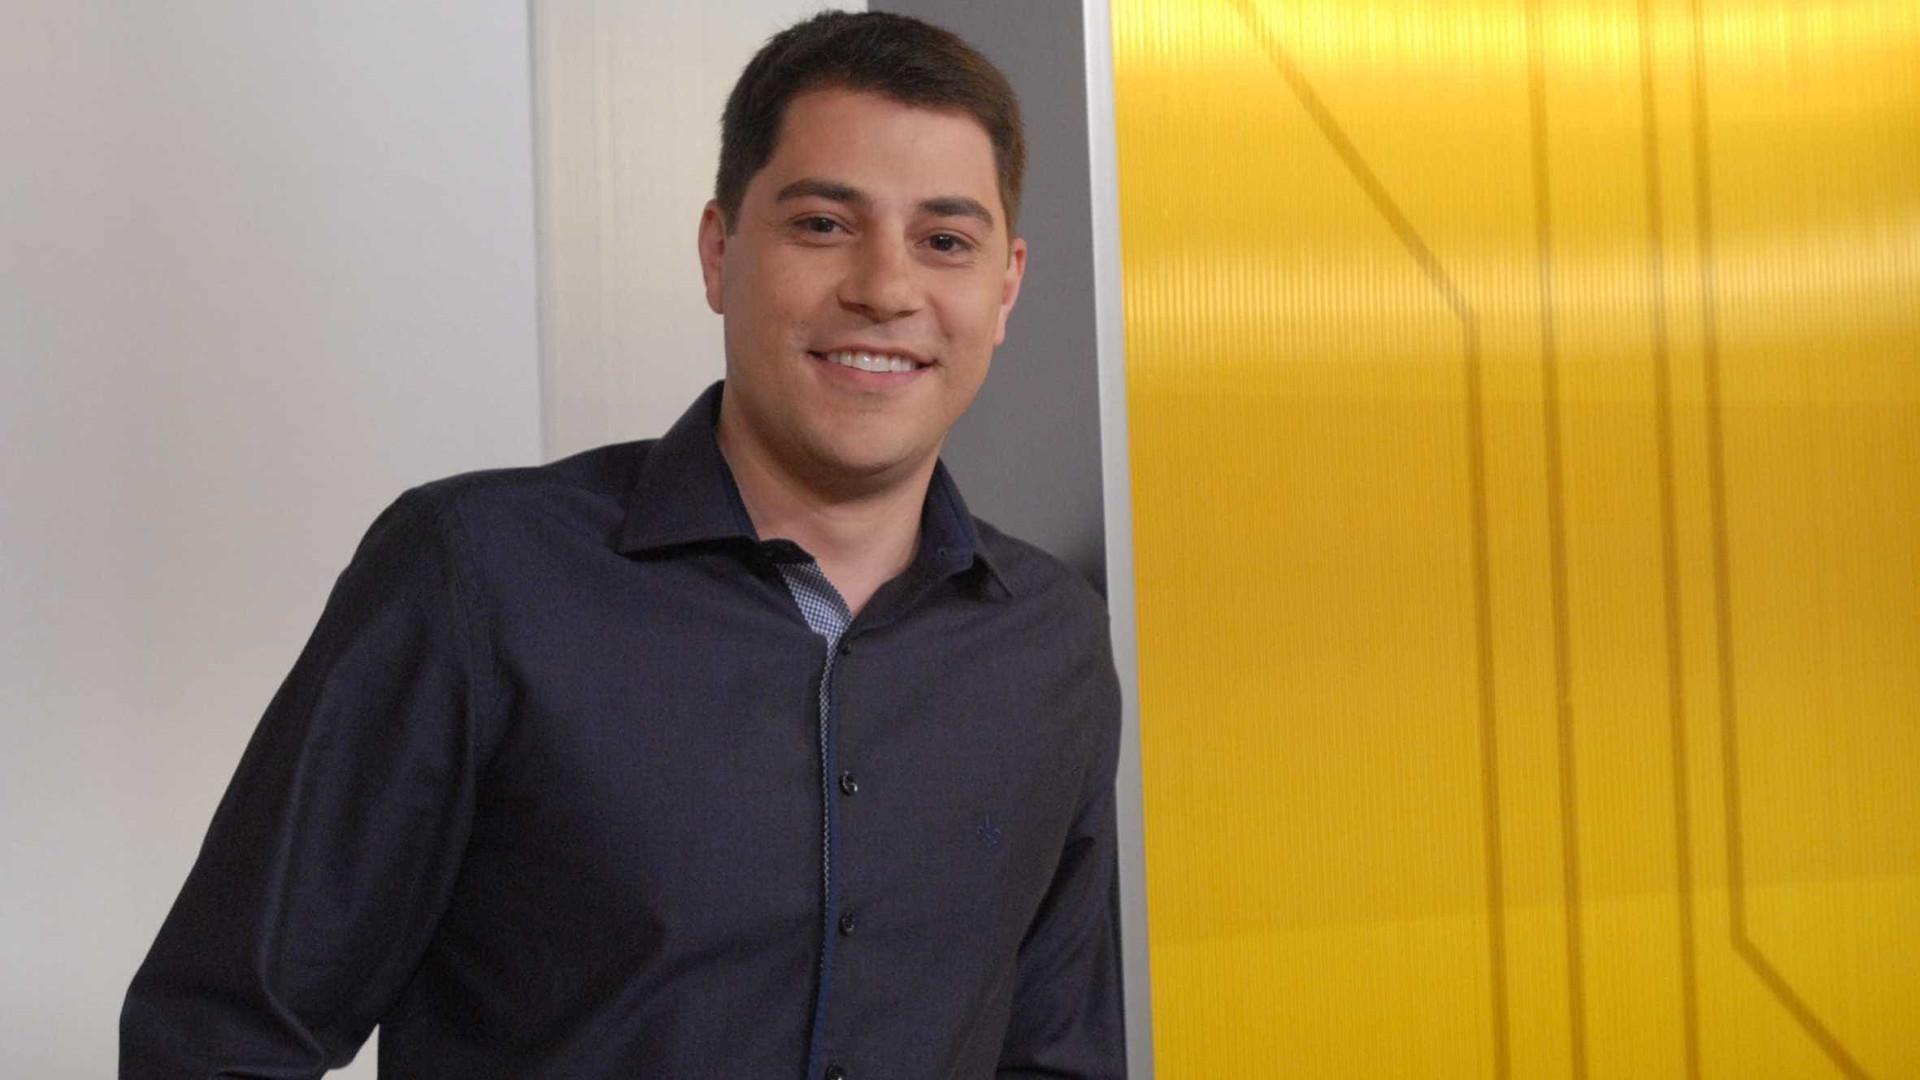 Após rumores sobre deixar a Globo, Evaristo posta mensagem intrigante